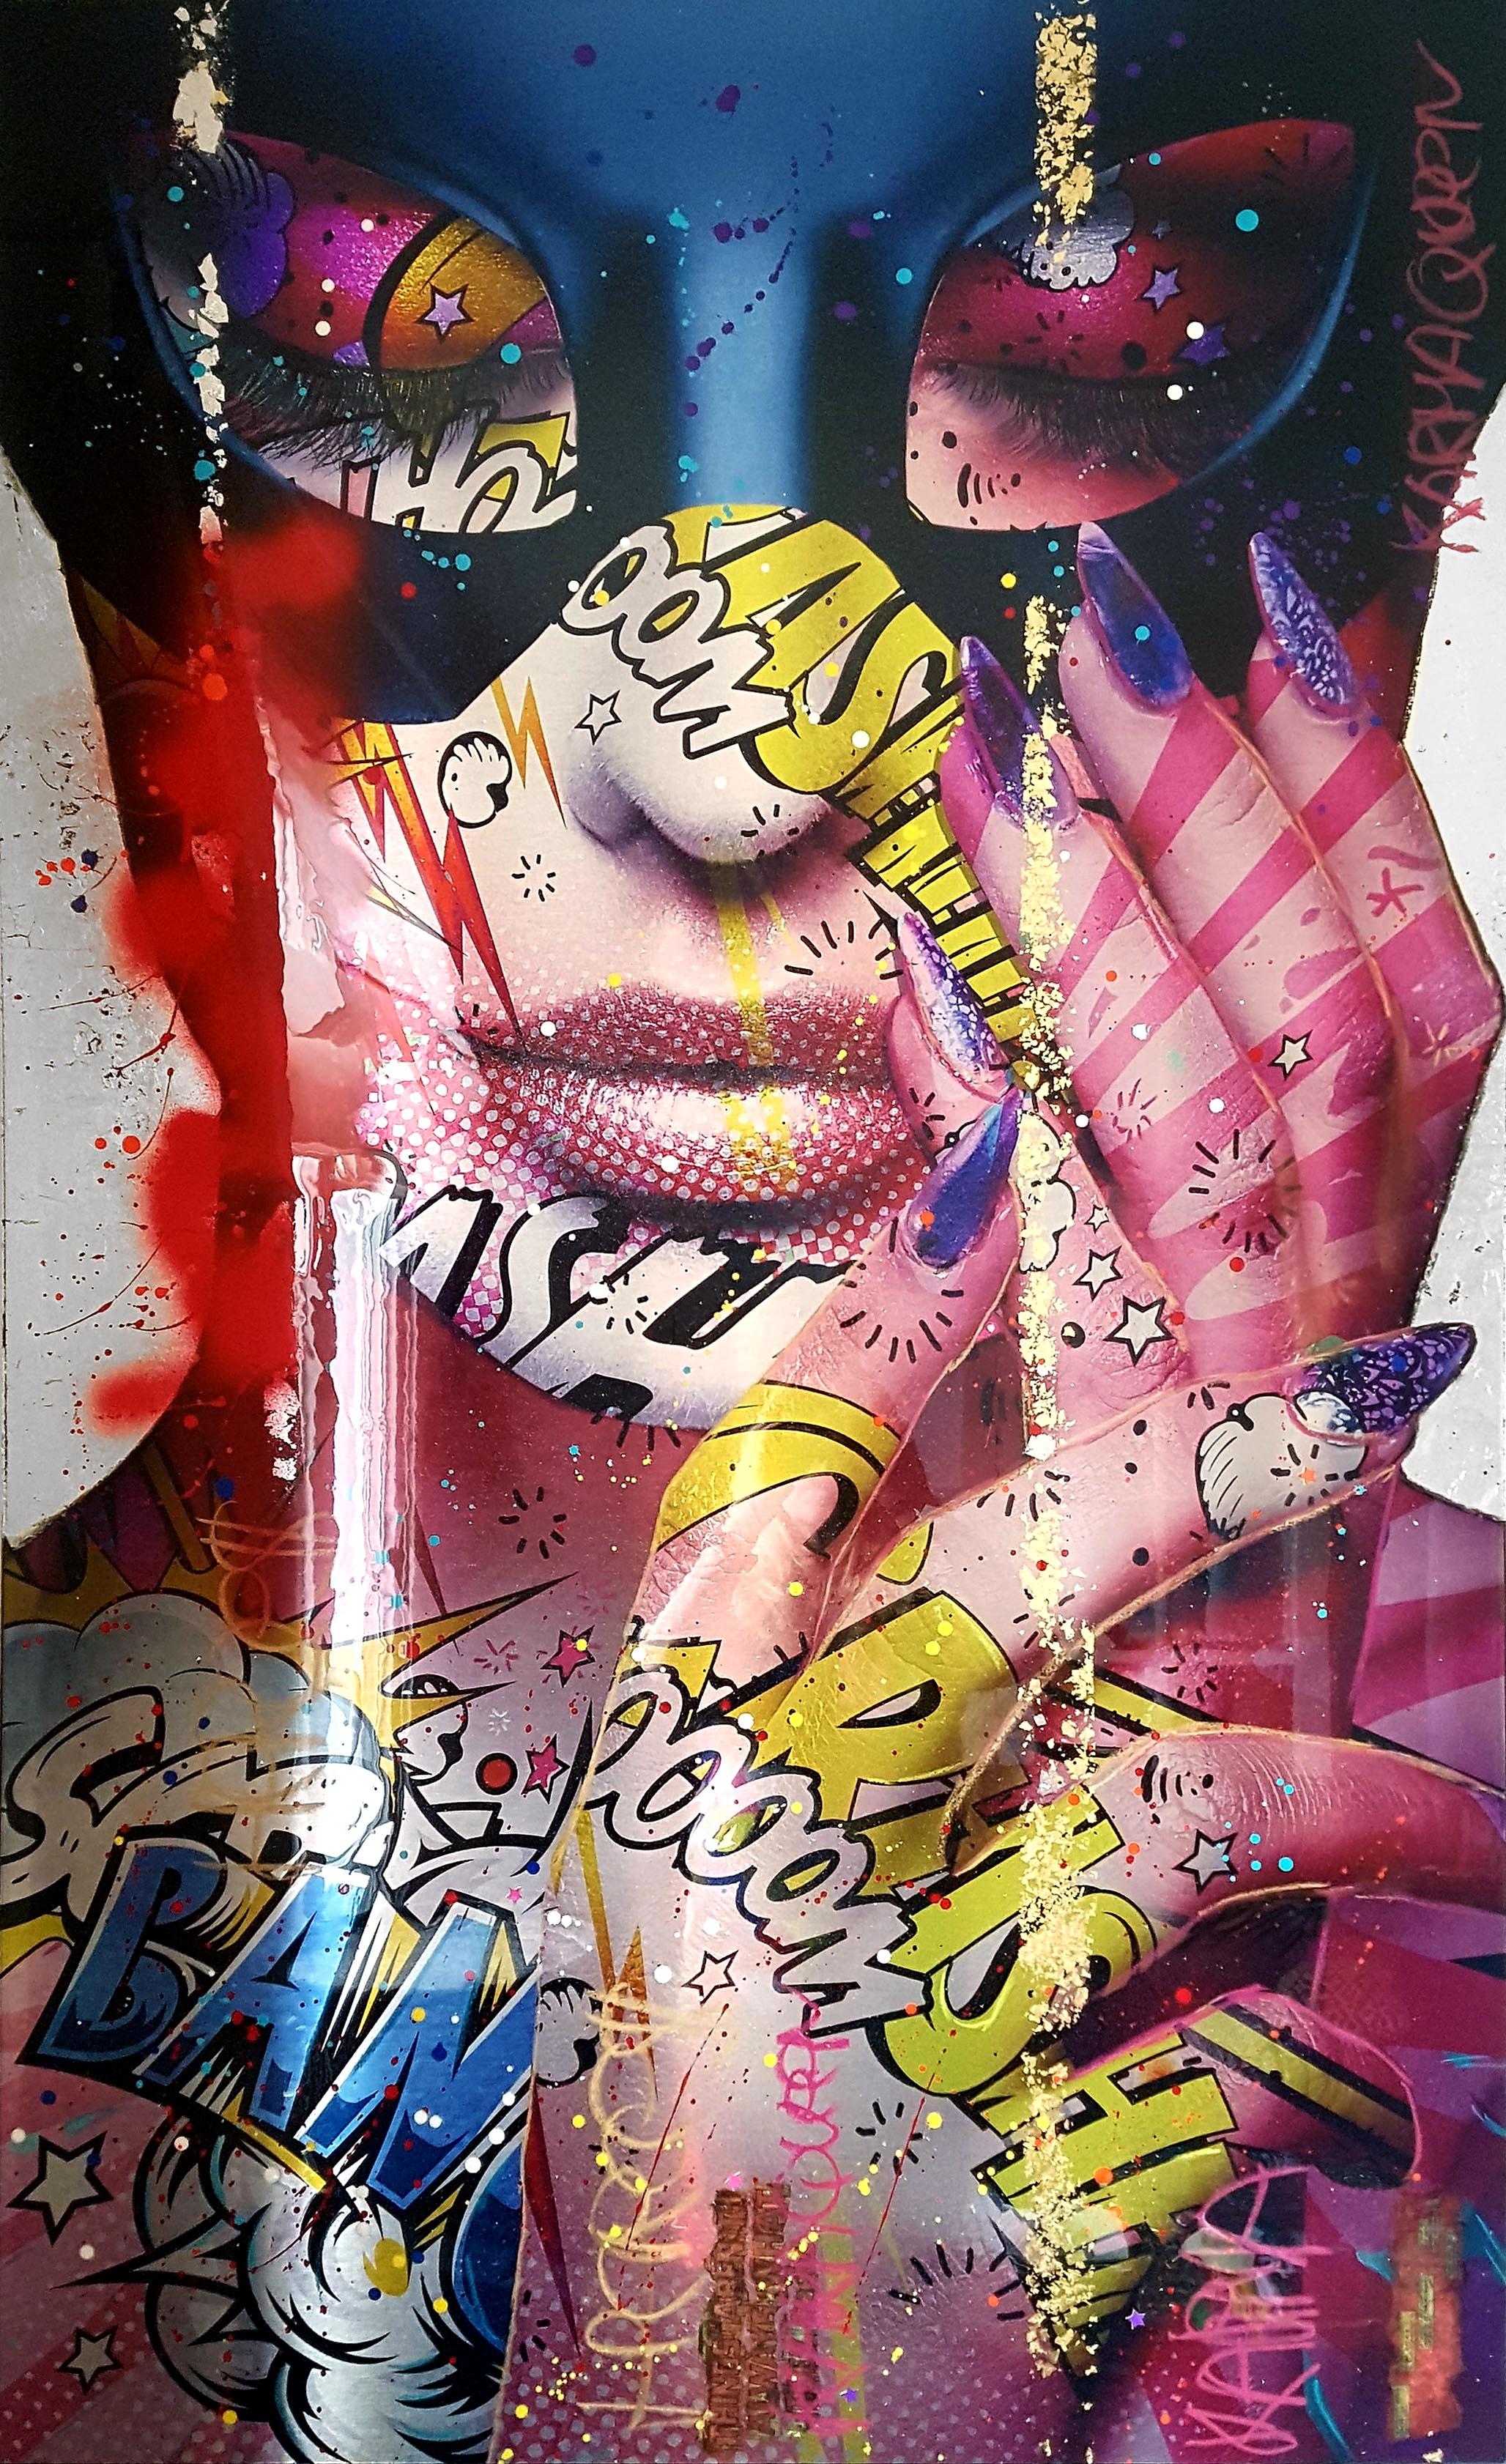 Karma Queen Monika Nowak pop art